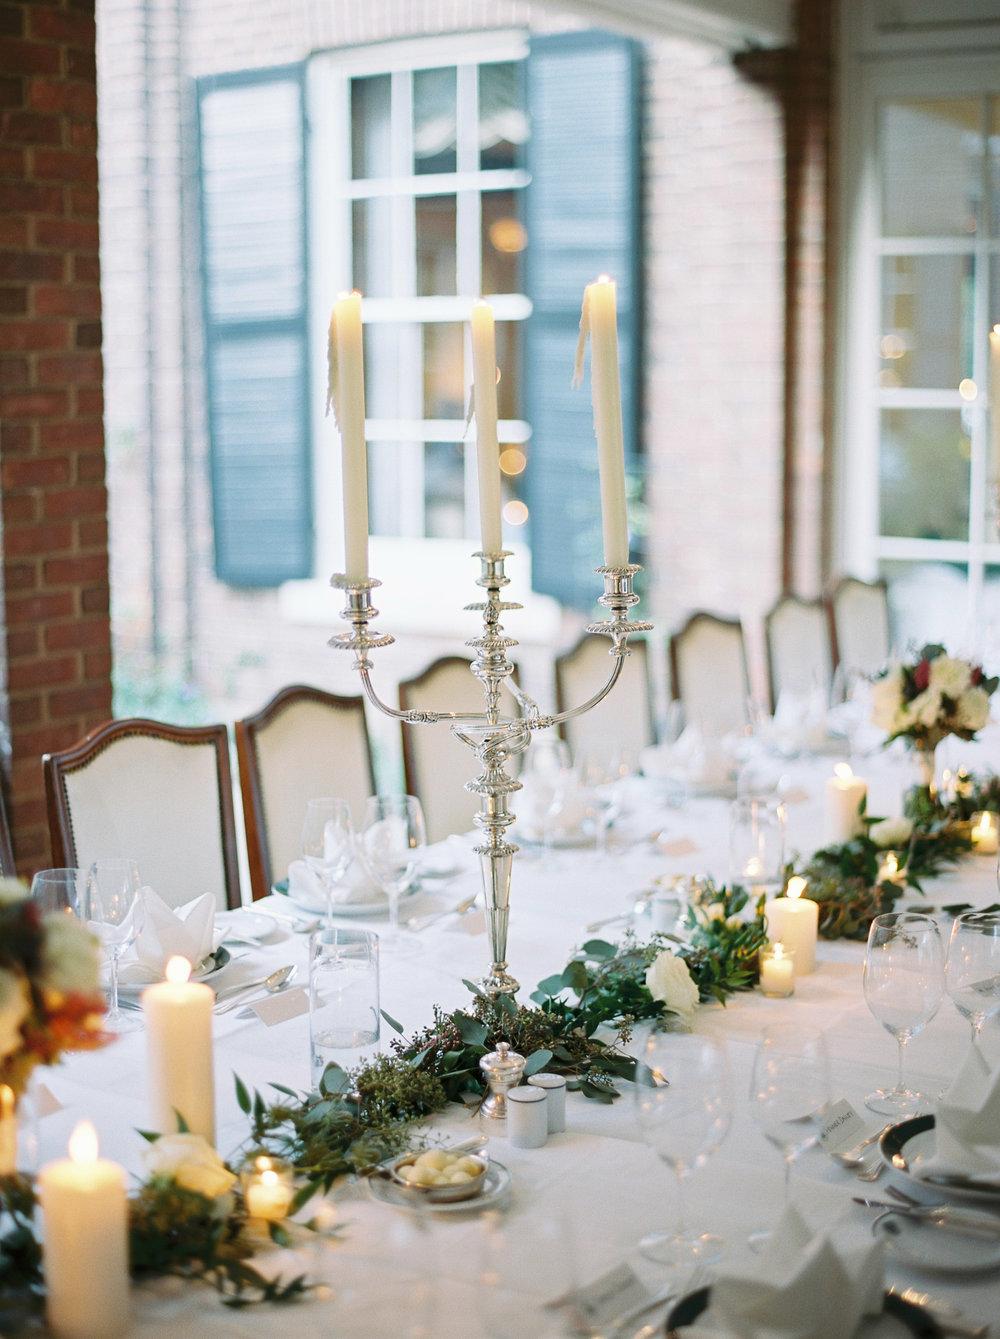 0613-Geneva-Ian-Wedding-Toronto Golf Club-When He Found Her-TorontoPhotographer.jpg